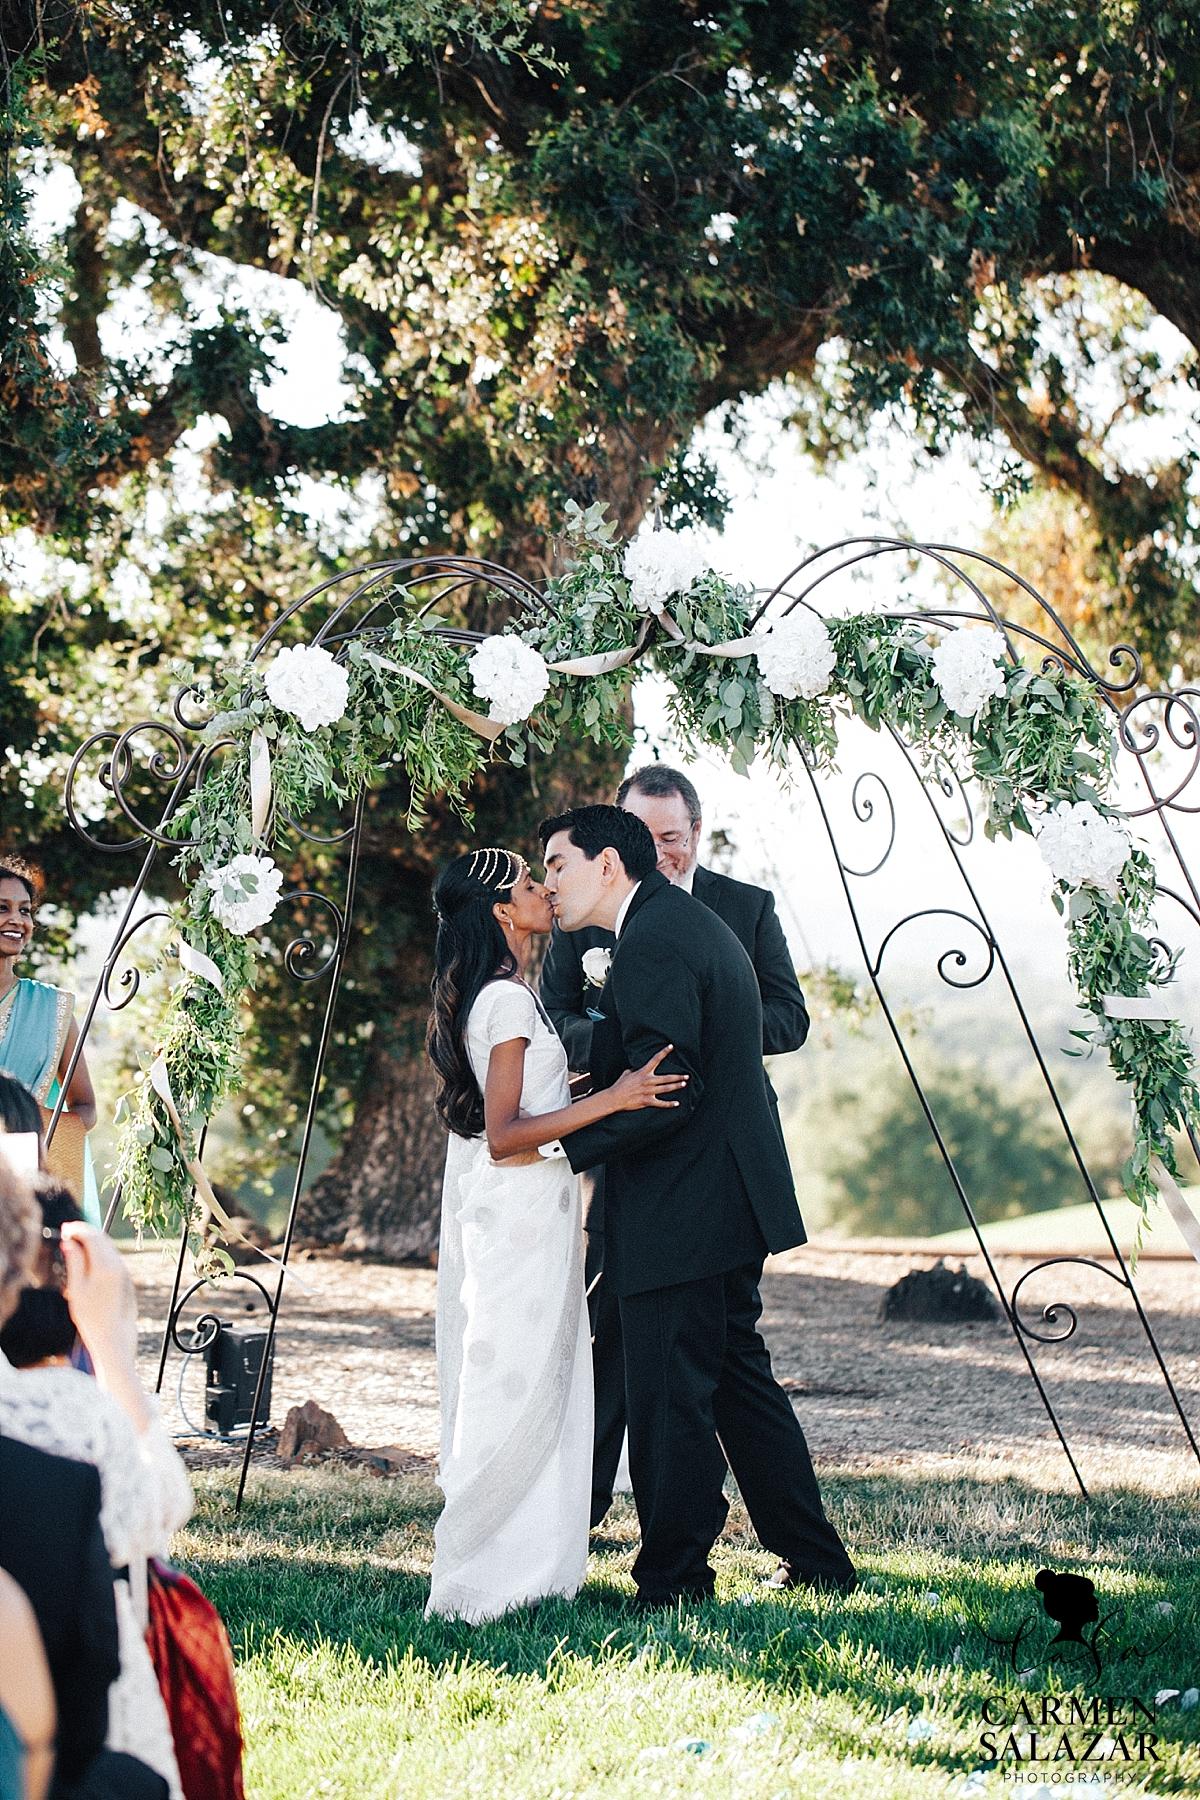 Christian - Indian Serrano Country Club Wedding - Carmen Salazar